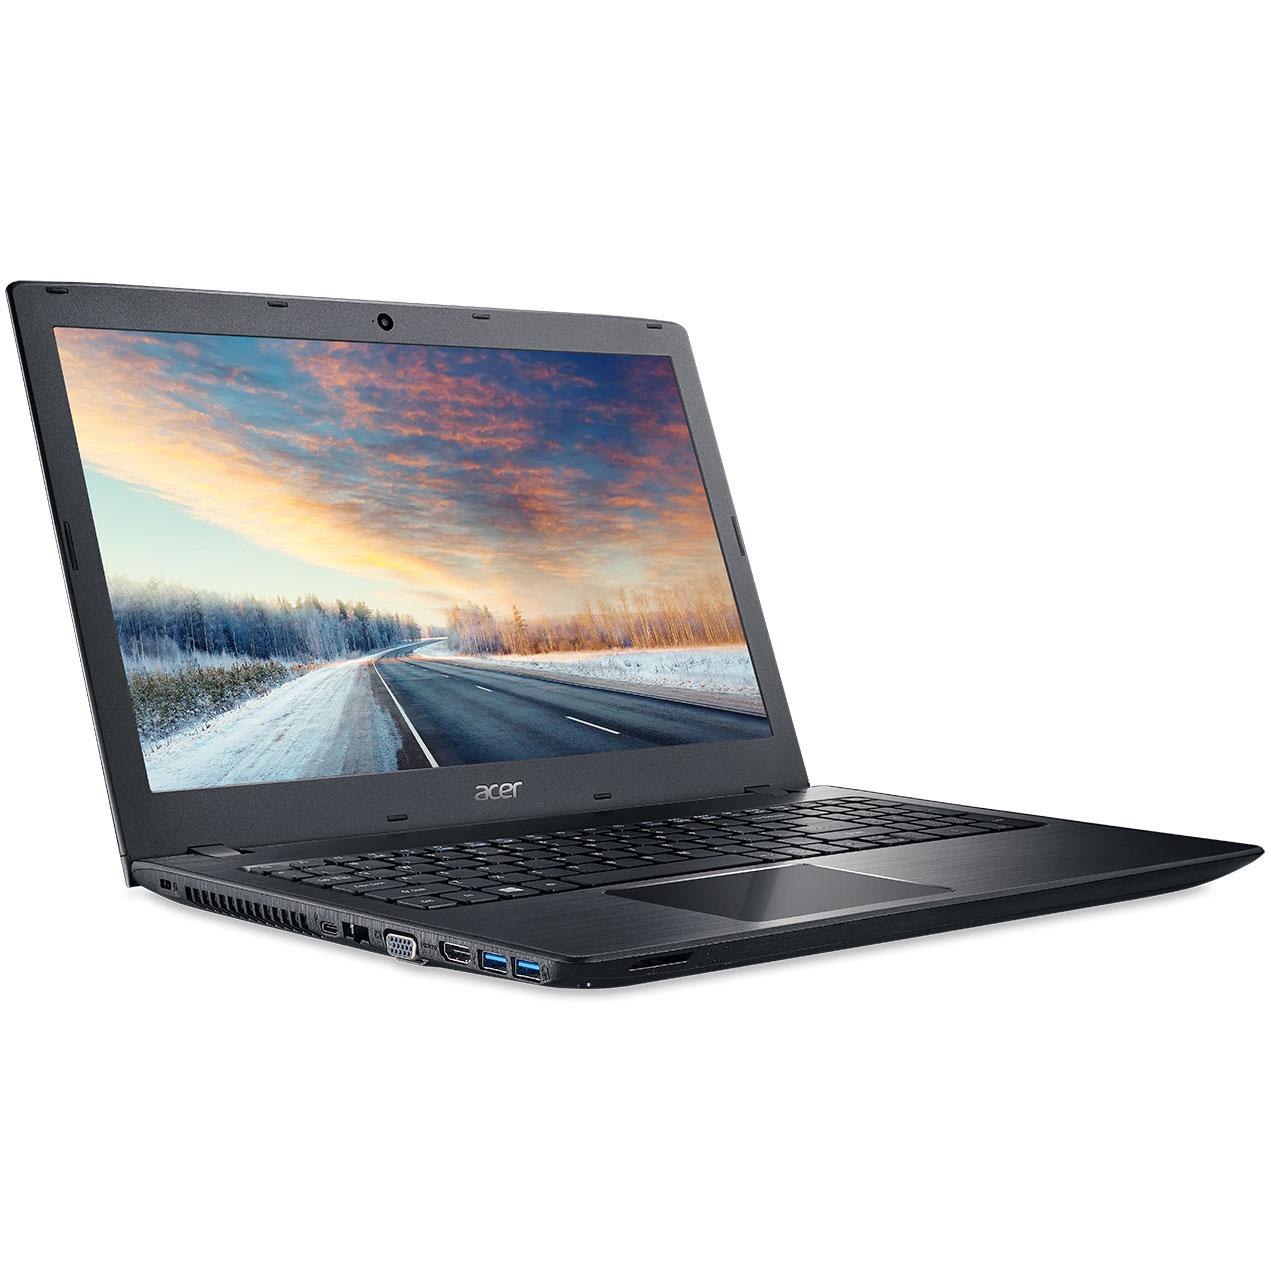 Acer NX.VDMEF.012 - PC portable Acer - Cybertek.fr - 4